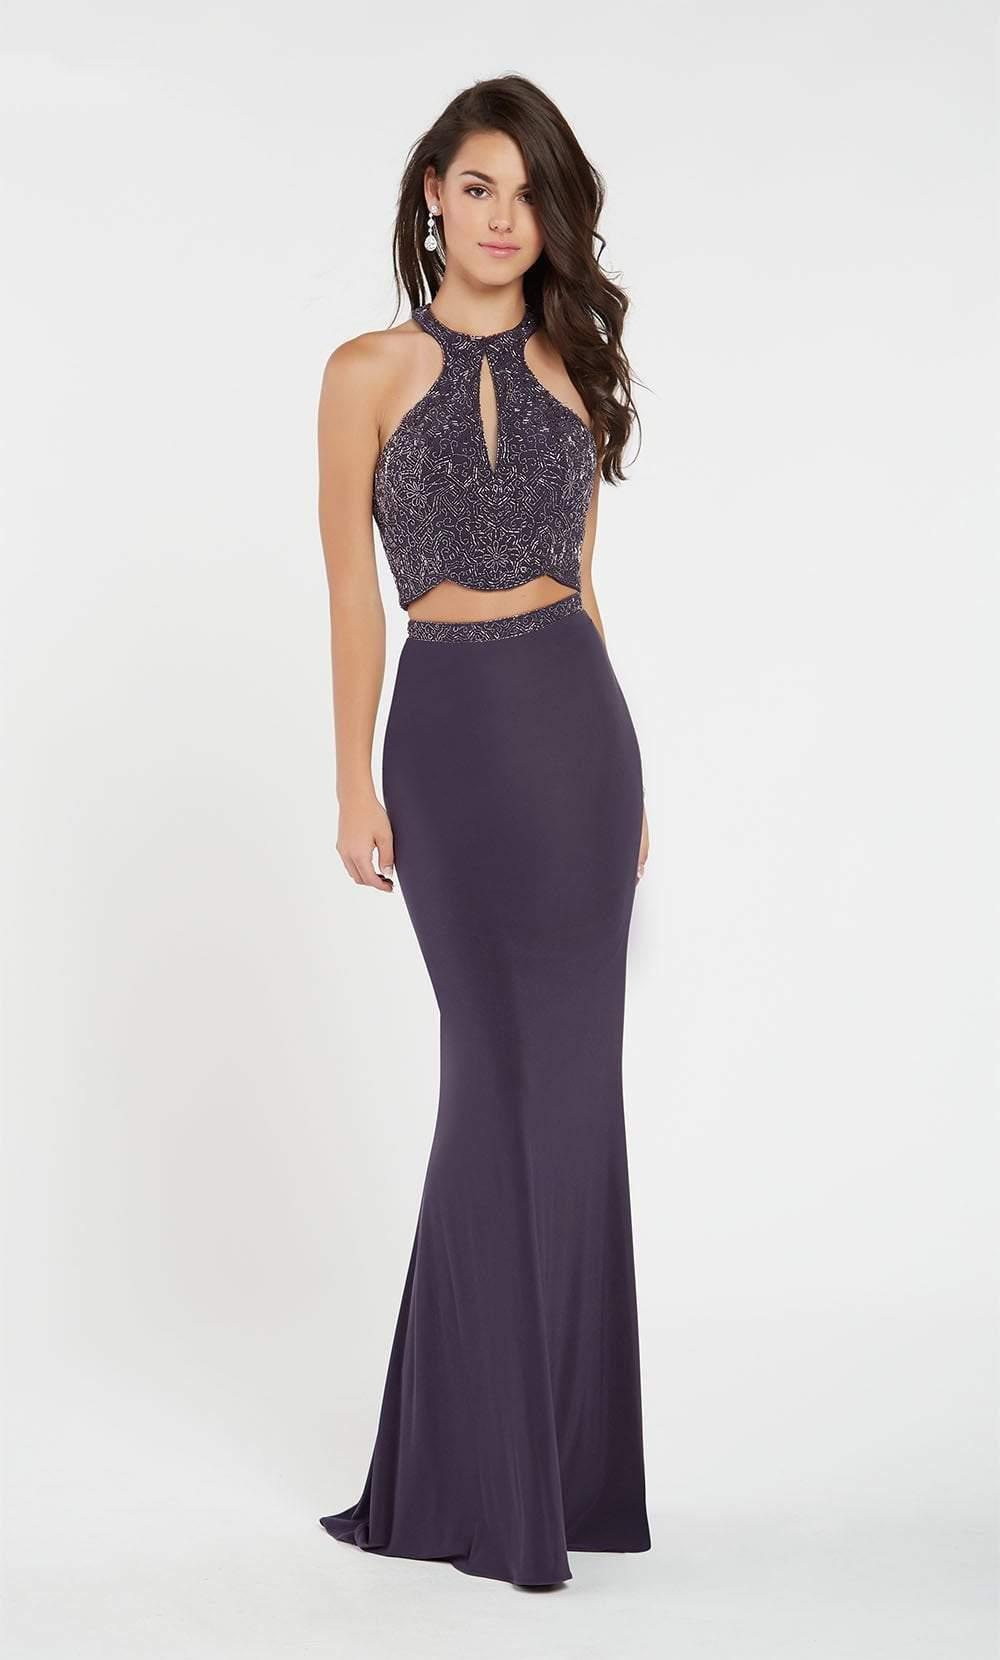 Alyce Paris - 60541 Two-Piece Beaded Cutout Bodice Sheath Gown